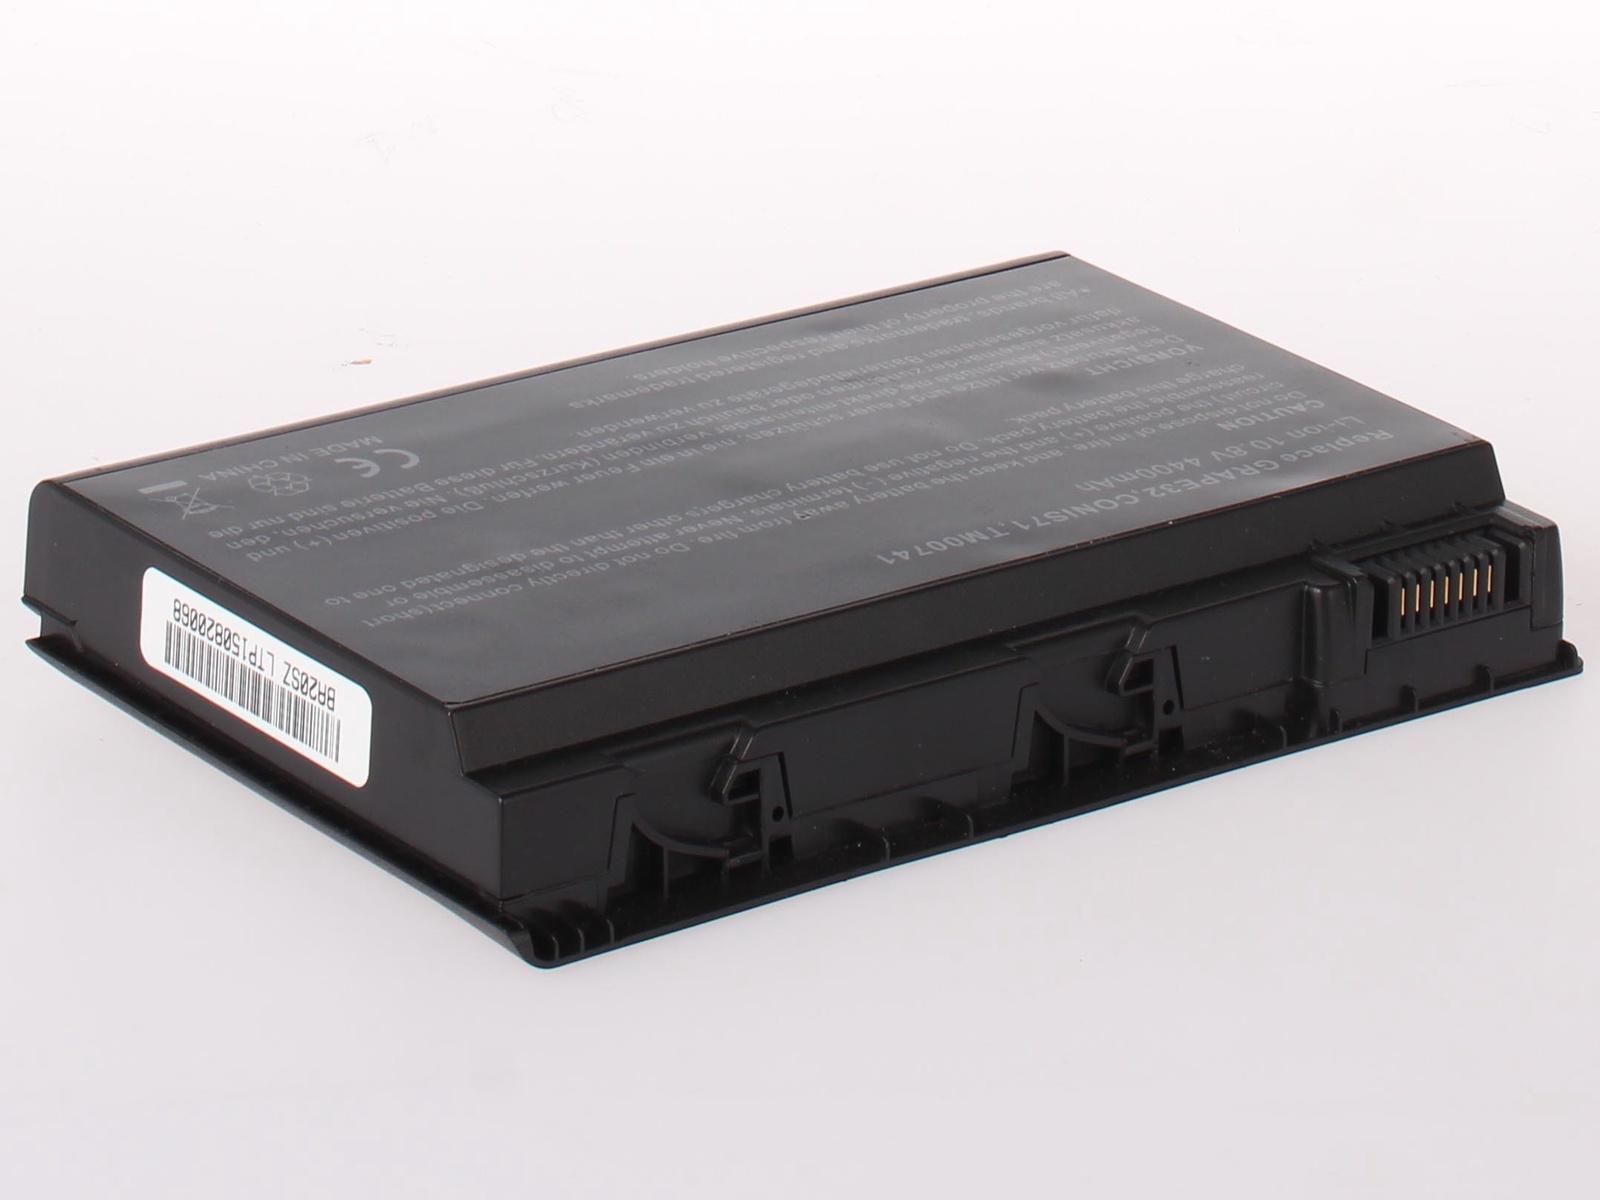 Аккумулятор для ноутбука AnyBatt для Acer Extensa 5220-301G08Mi, TravelMate 5710, Extensa 5630G-582G25Mi, Extensa 5120, Extensa 5620G-2A2G25Mi, Travelmate 5720G-812G25Mi, TravelMate 720, TravelMate 5320-101G12Mi